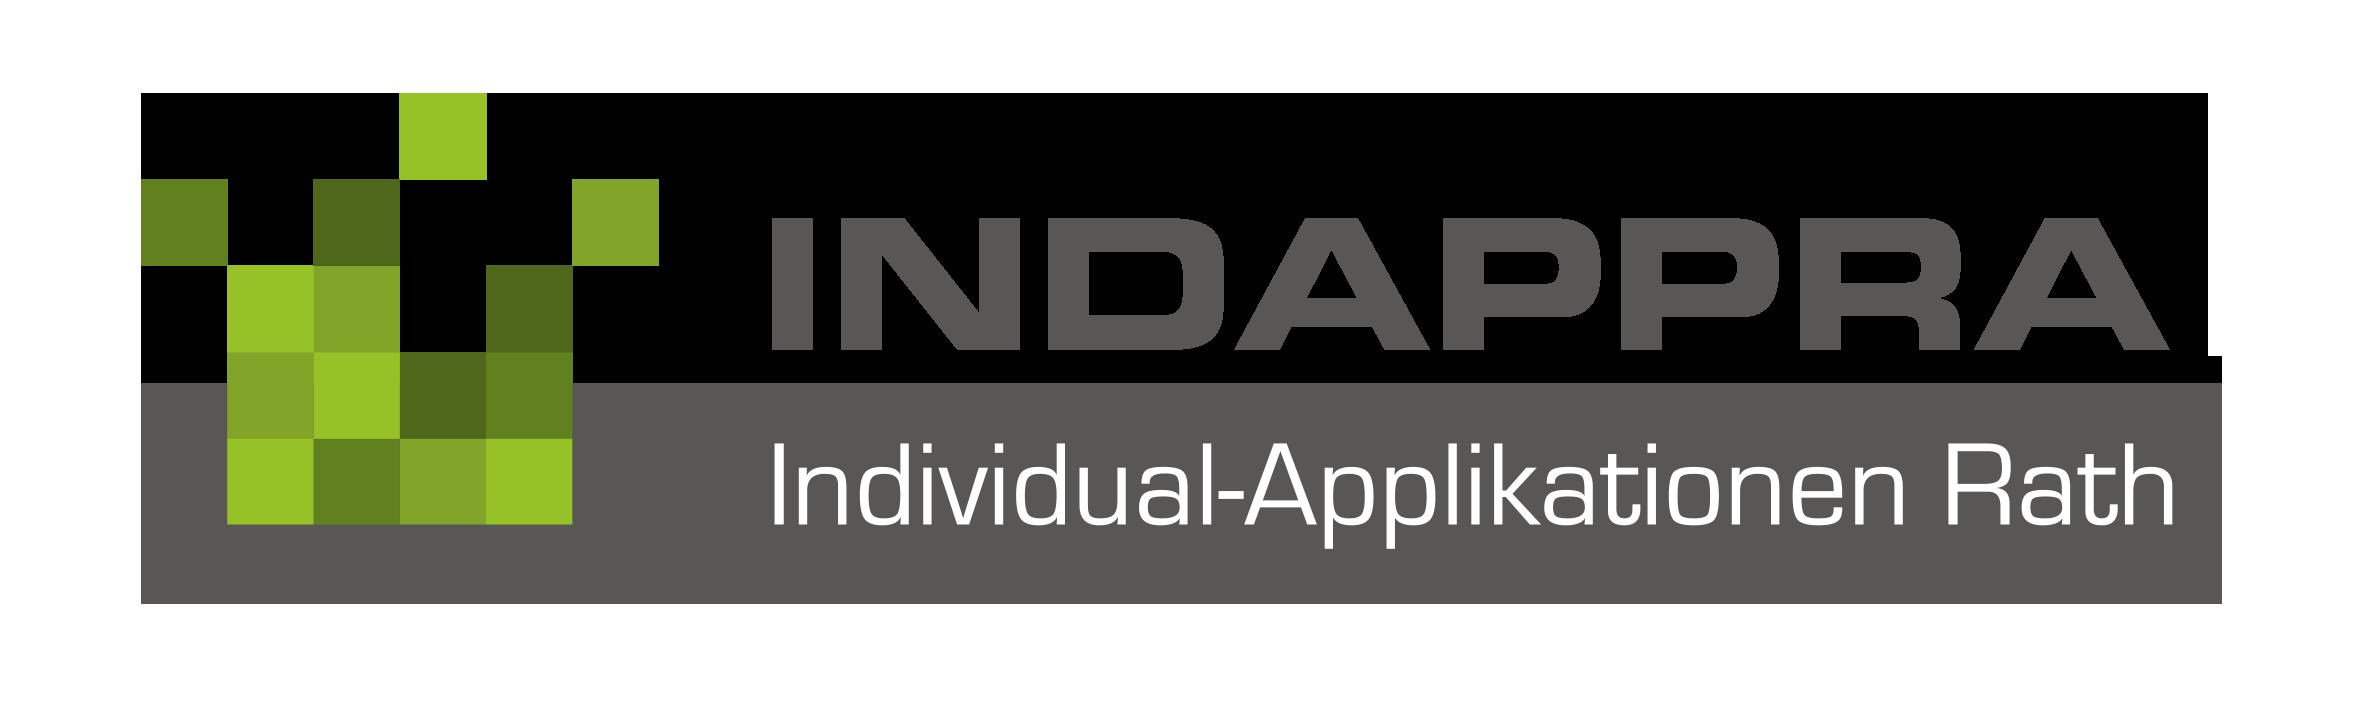 INDAPPRA – Individual-Applikationen Rath